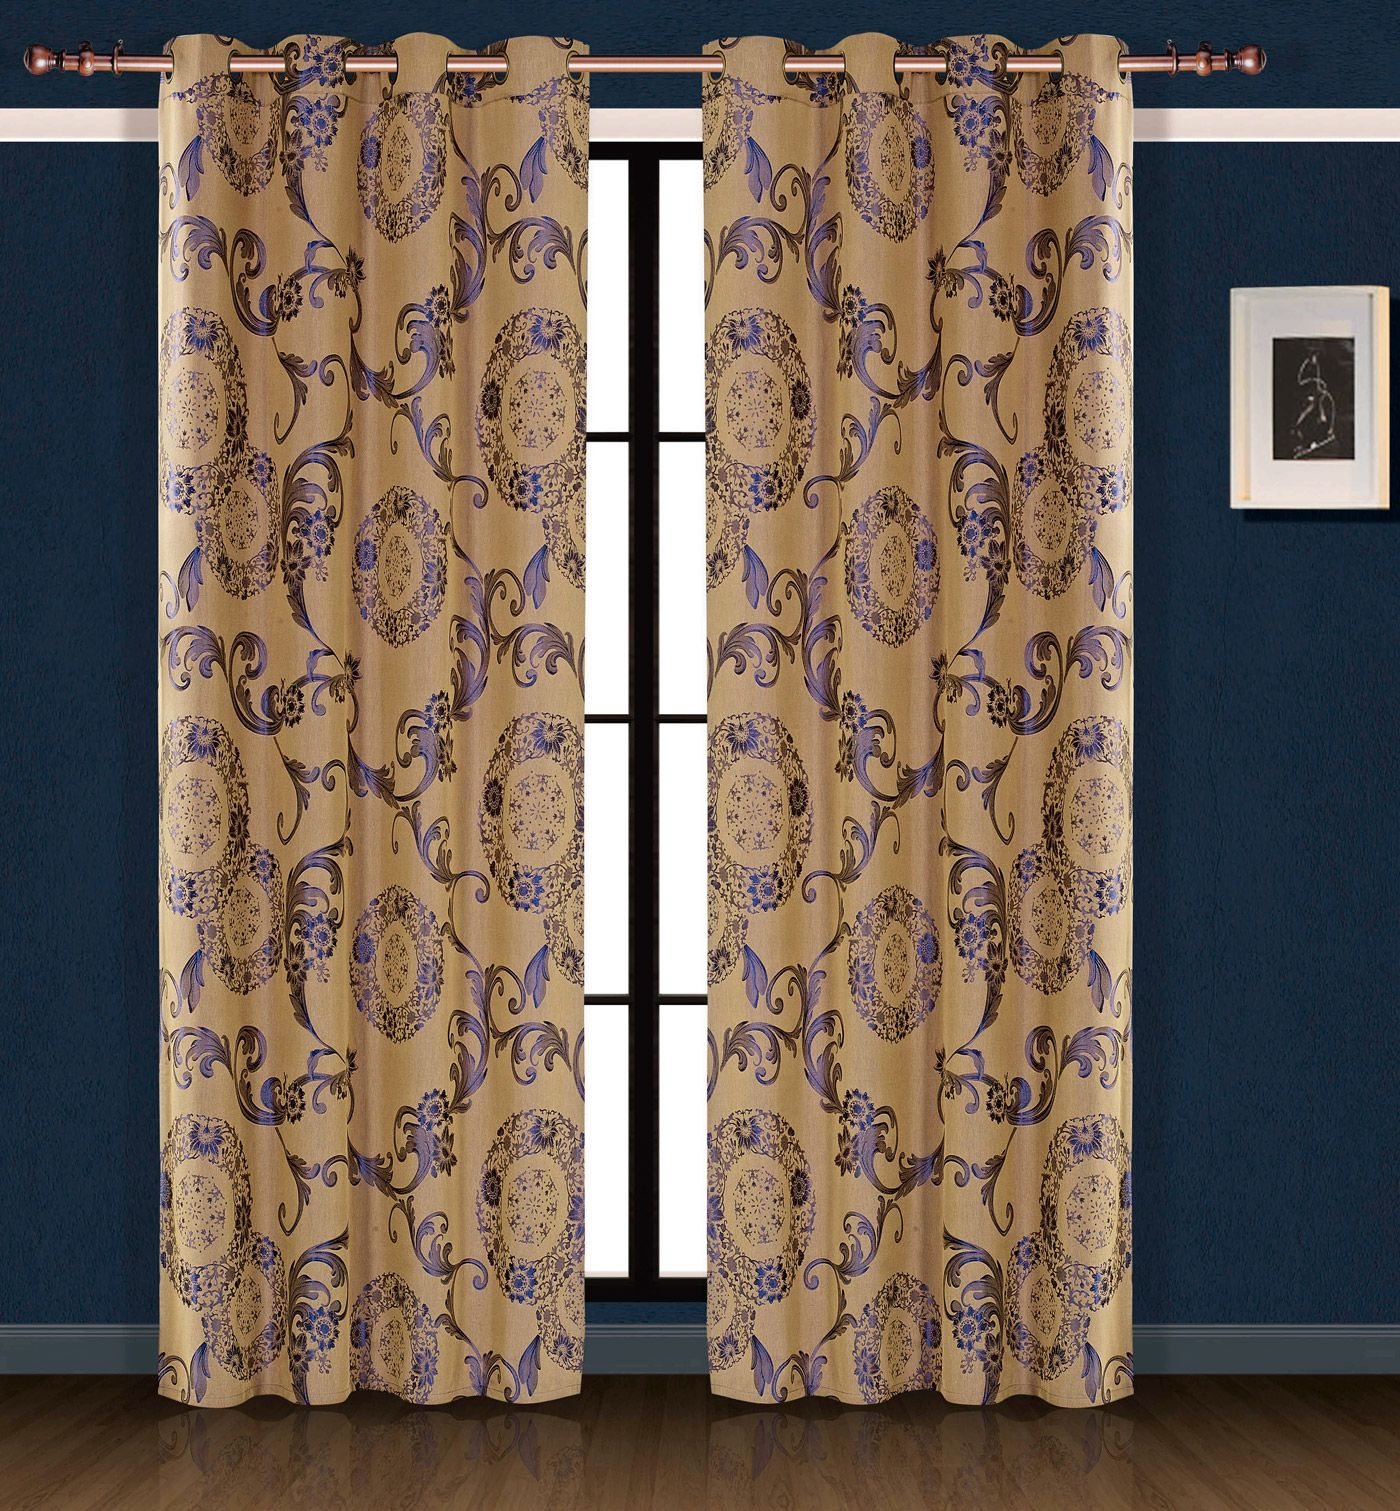 469-Venus-Dolce-Mela-Window-Treatments-Drapes-Curtain-Panel.jpg